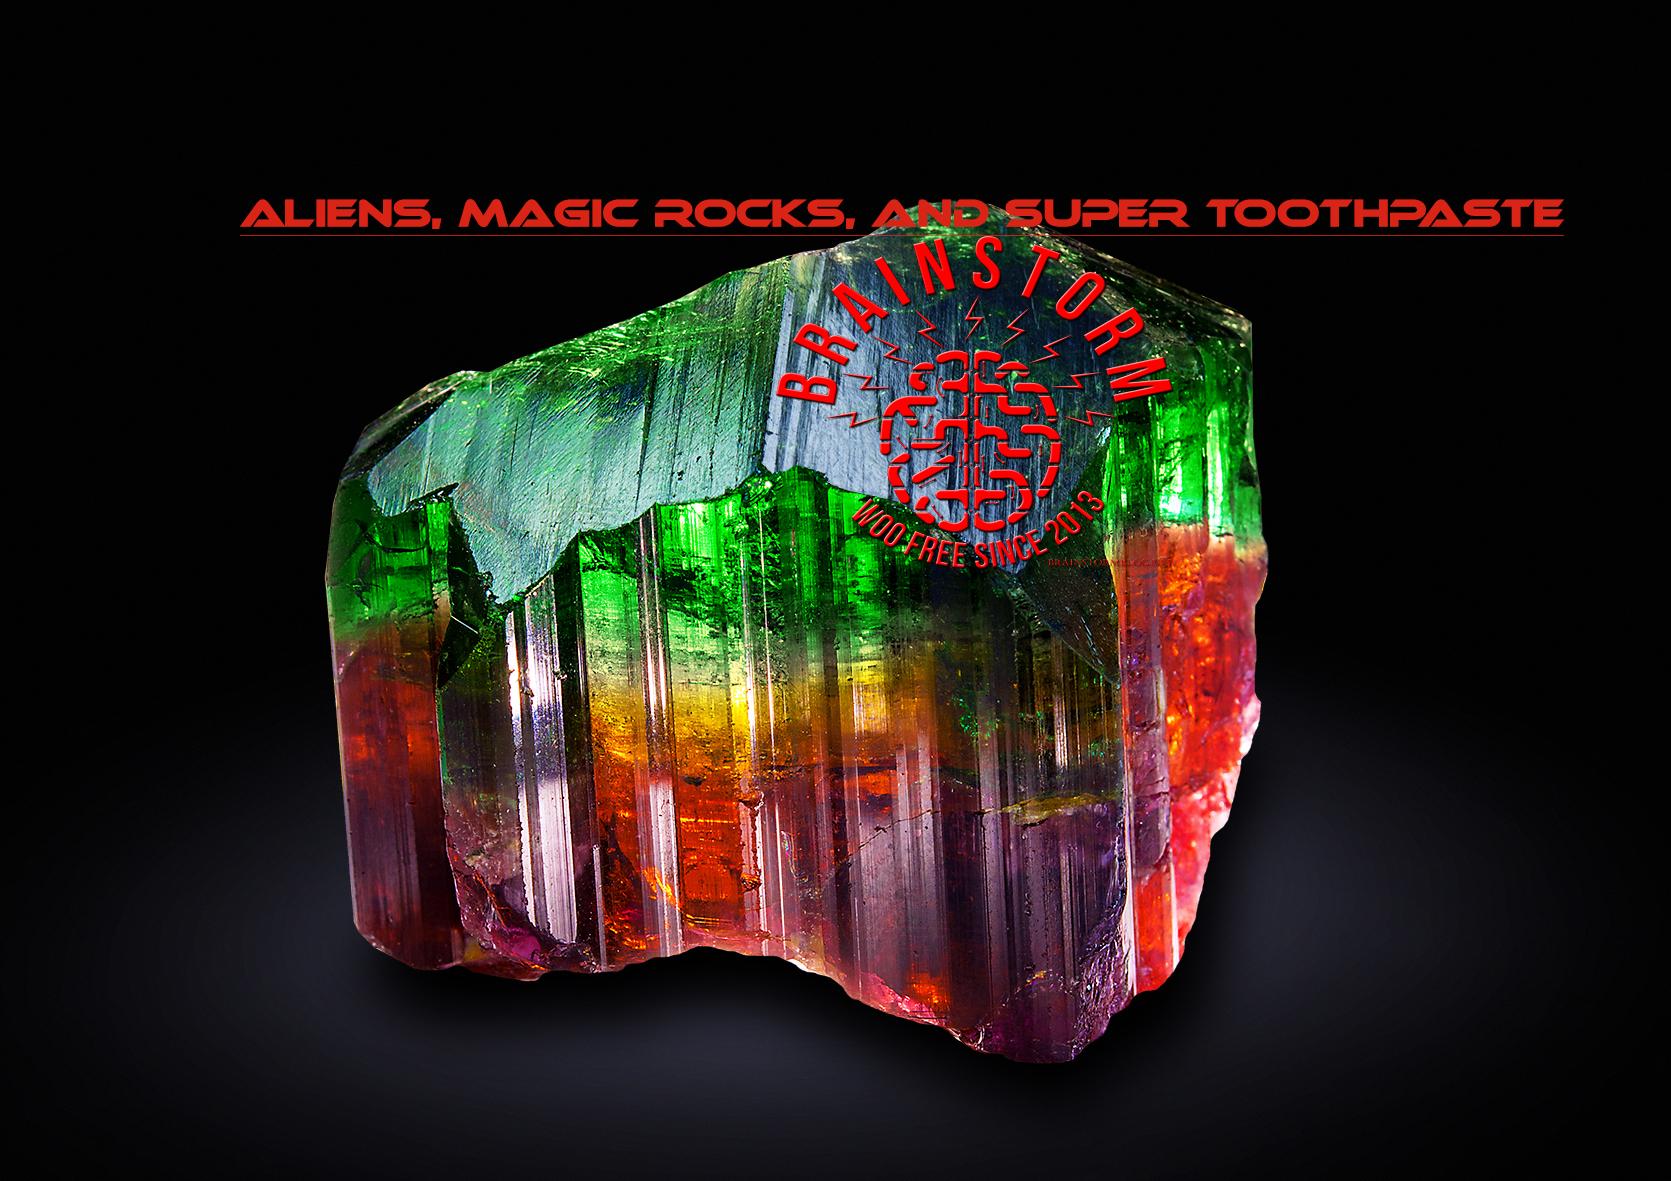 Aliens-Magic-Rocks-and-Super-Toothpaste.jpg